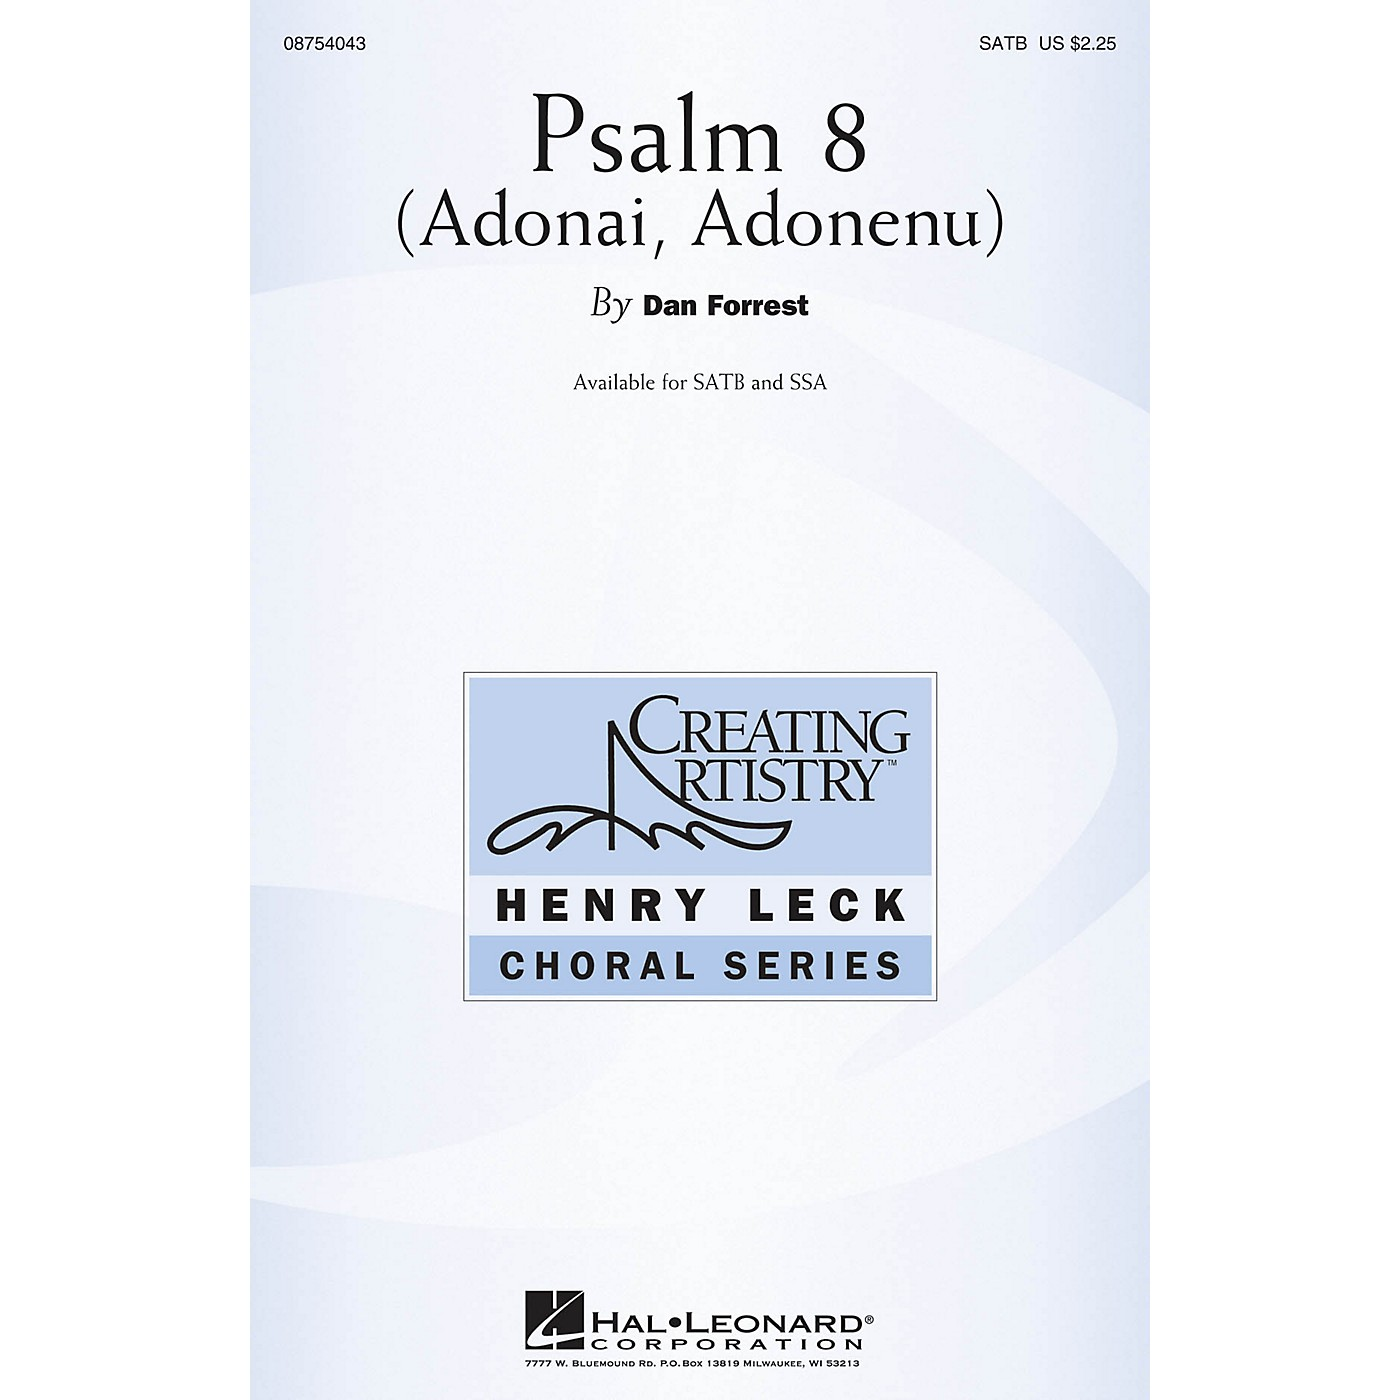 Hal Leonard Psalm 8 (Adonai, Adonenu) SATB composed by Dan Forrest thumbnail